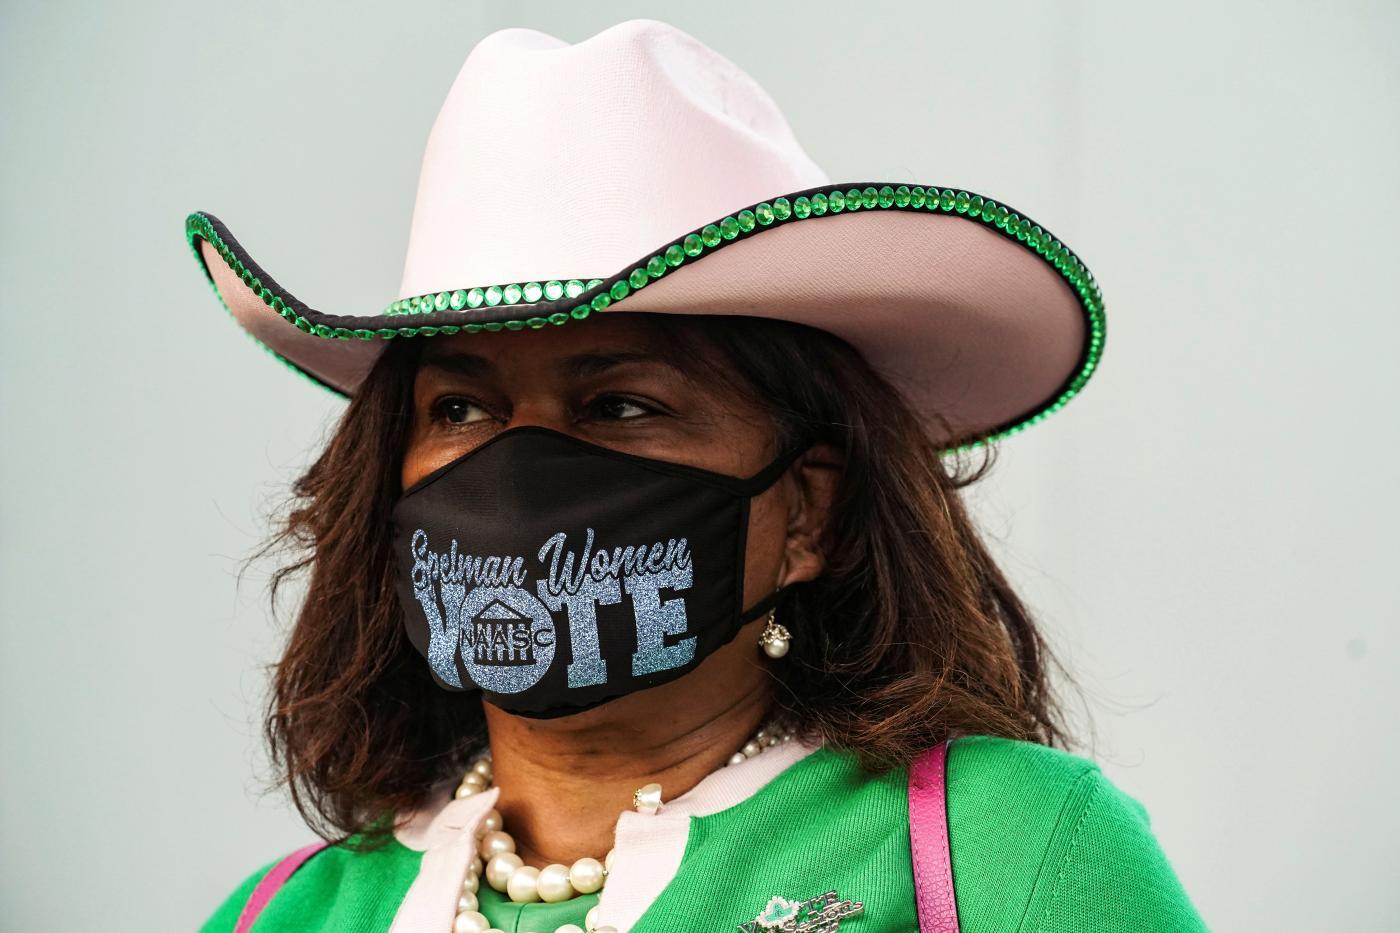 Foto de Travis County, Texas, registrou número recorde de eleitores – Quartzo